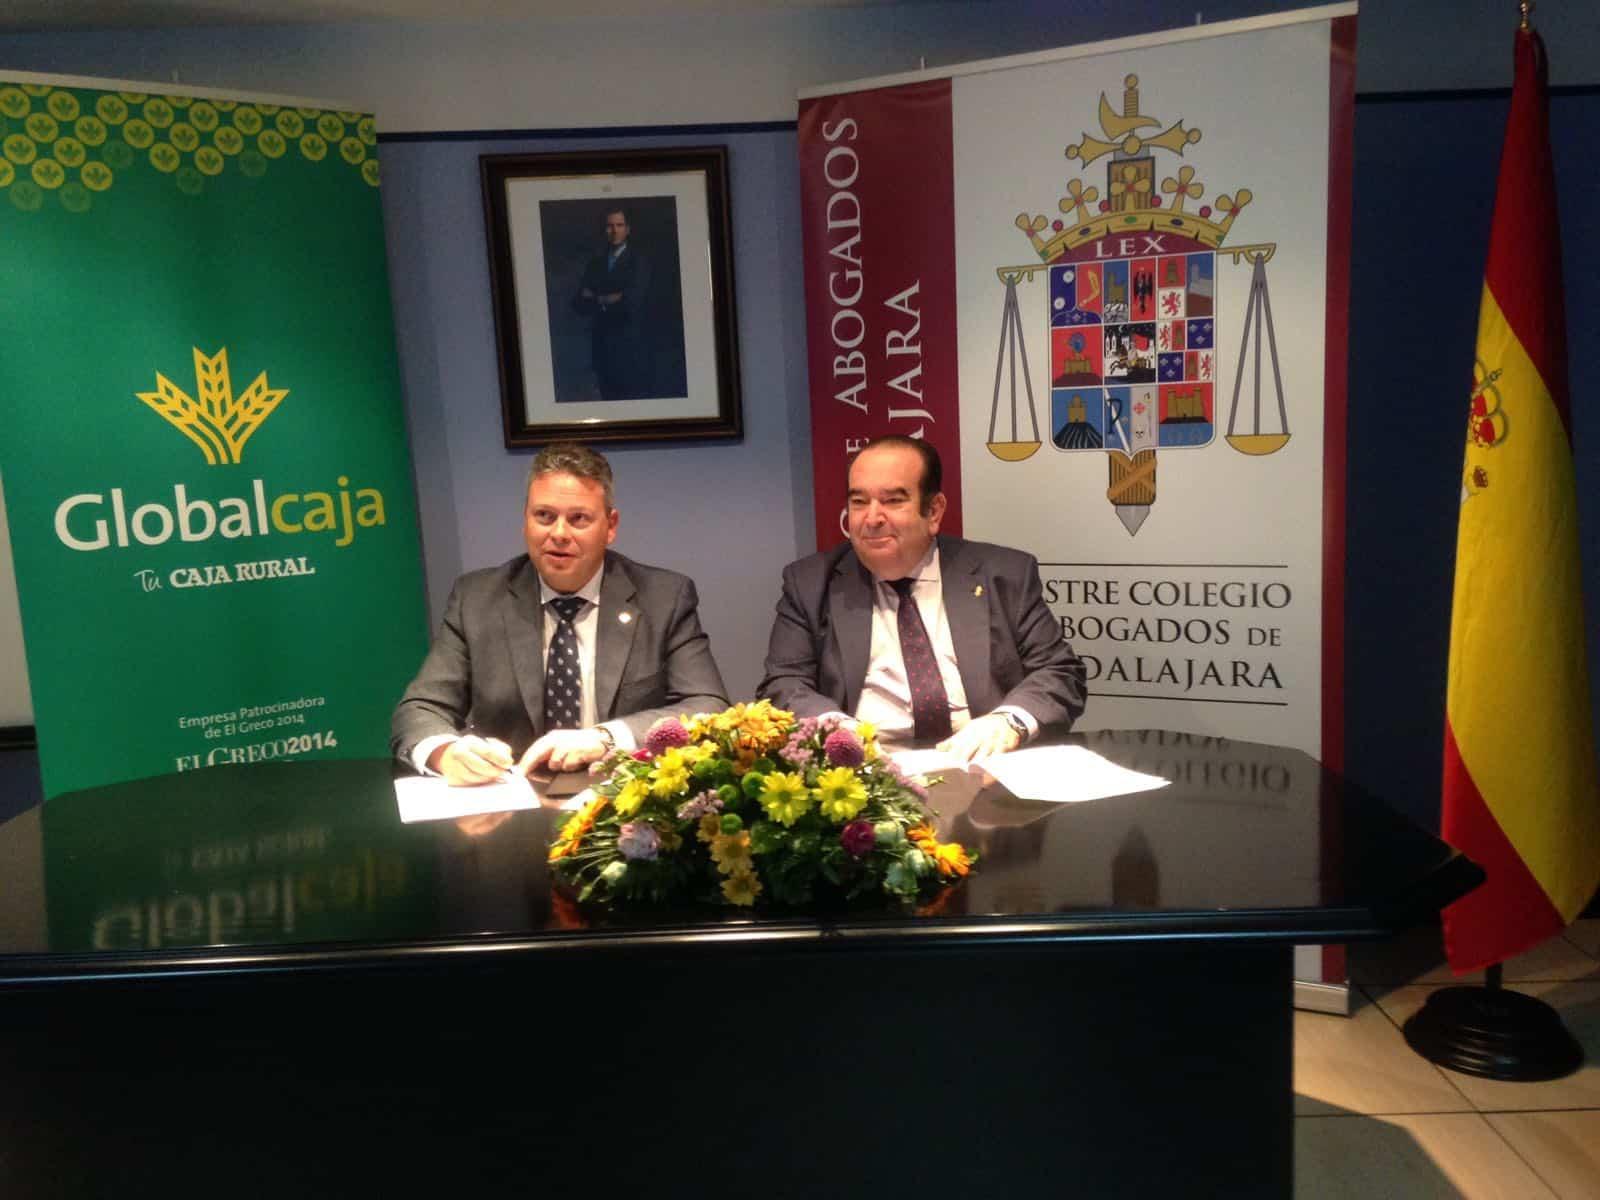 https://blog.globalcaja.es/wp-content/uploads/2017/11/FIRMA-CONVENIO-COLEGIO-OFICIAL-DE-ABOGADOS-DE-GUADALAJARA.jpg